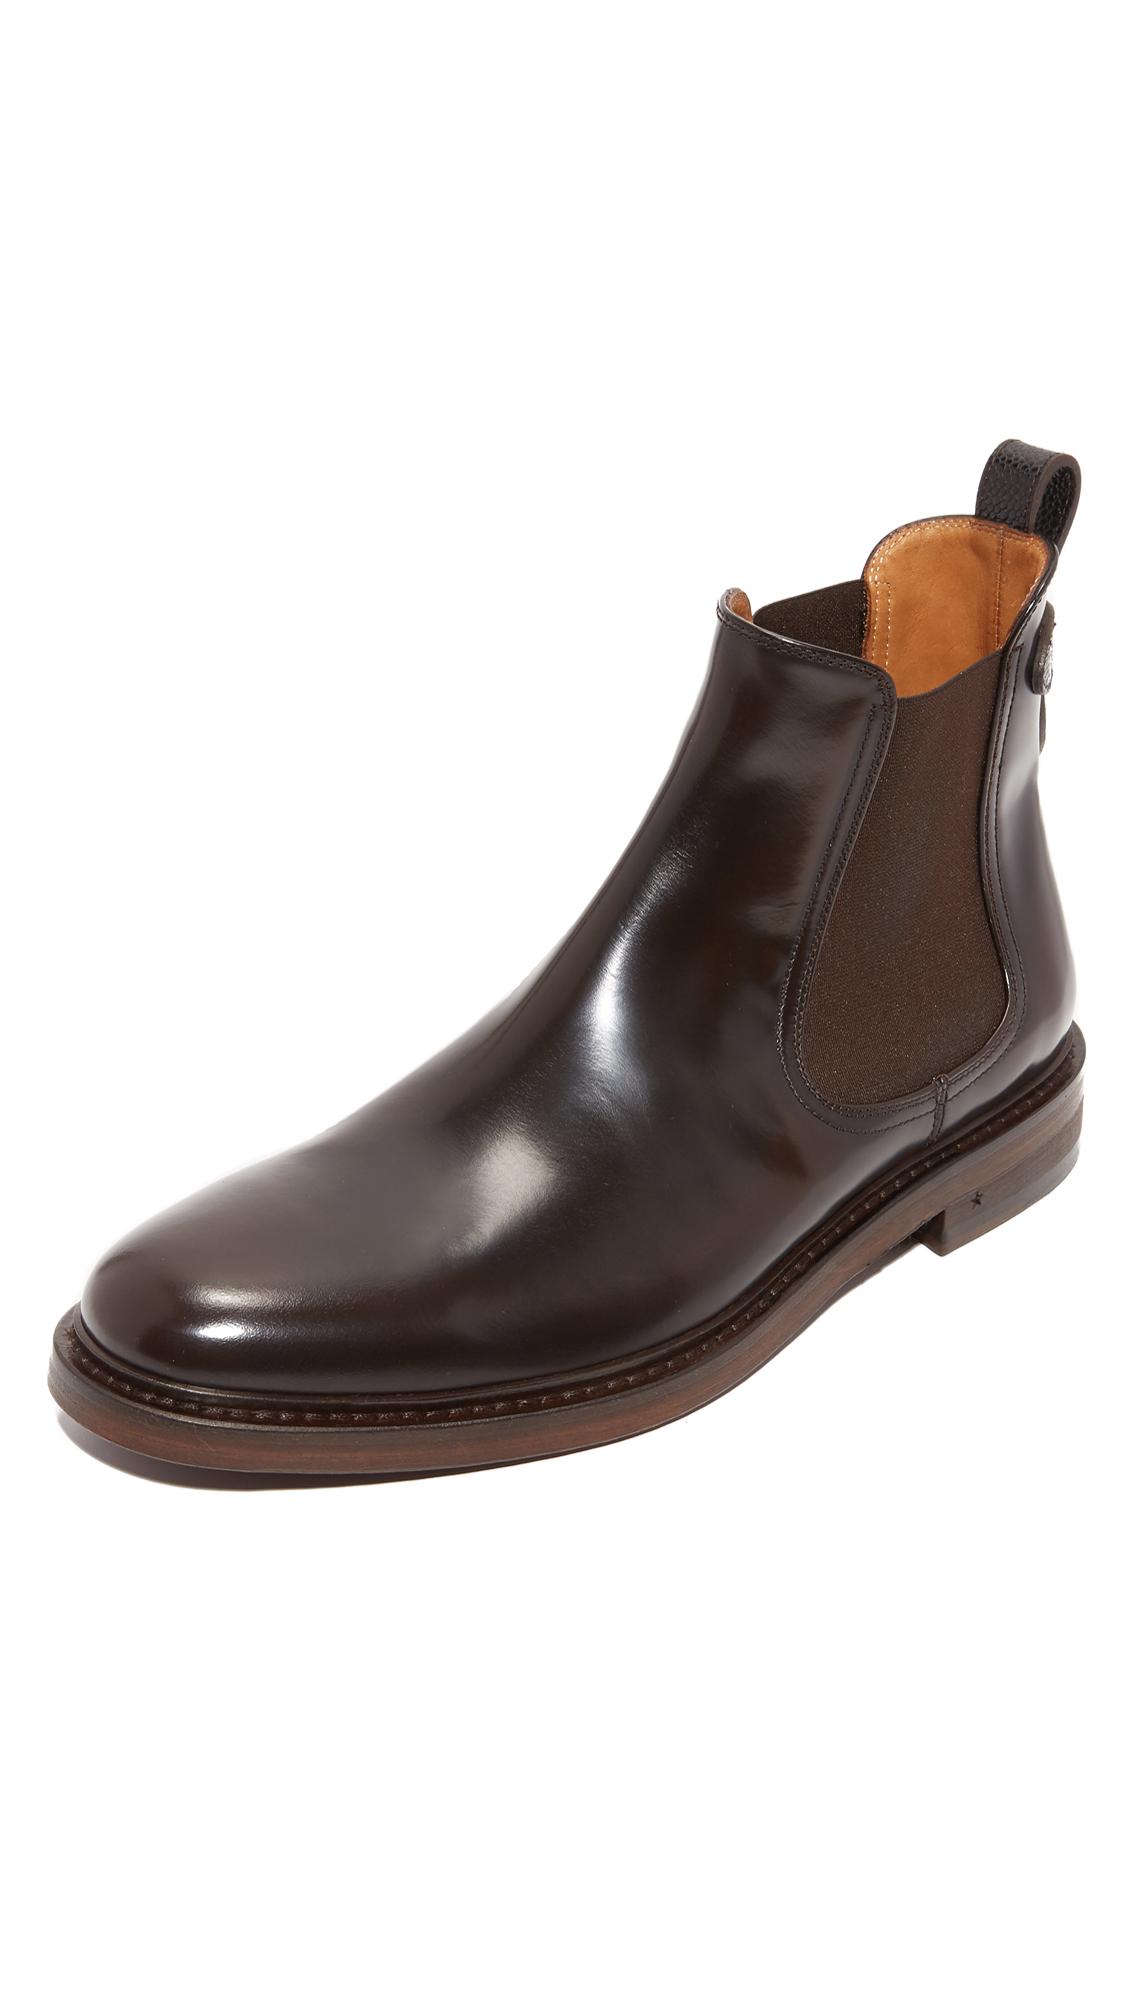 21658a2a0e0c George Brown BILT Fulton Chelsea Boots   EAST DANE